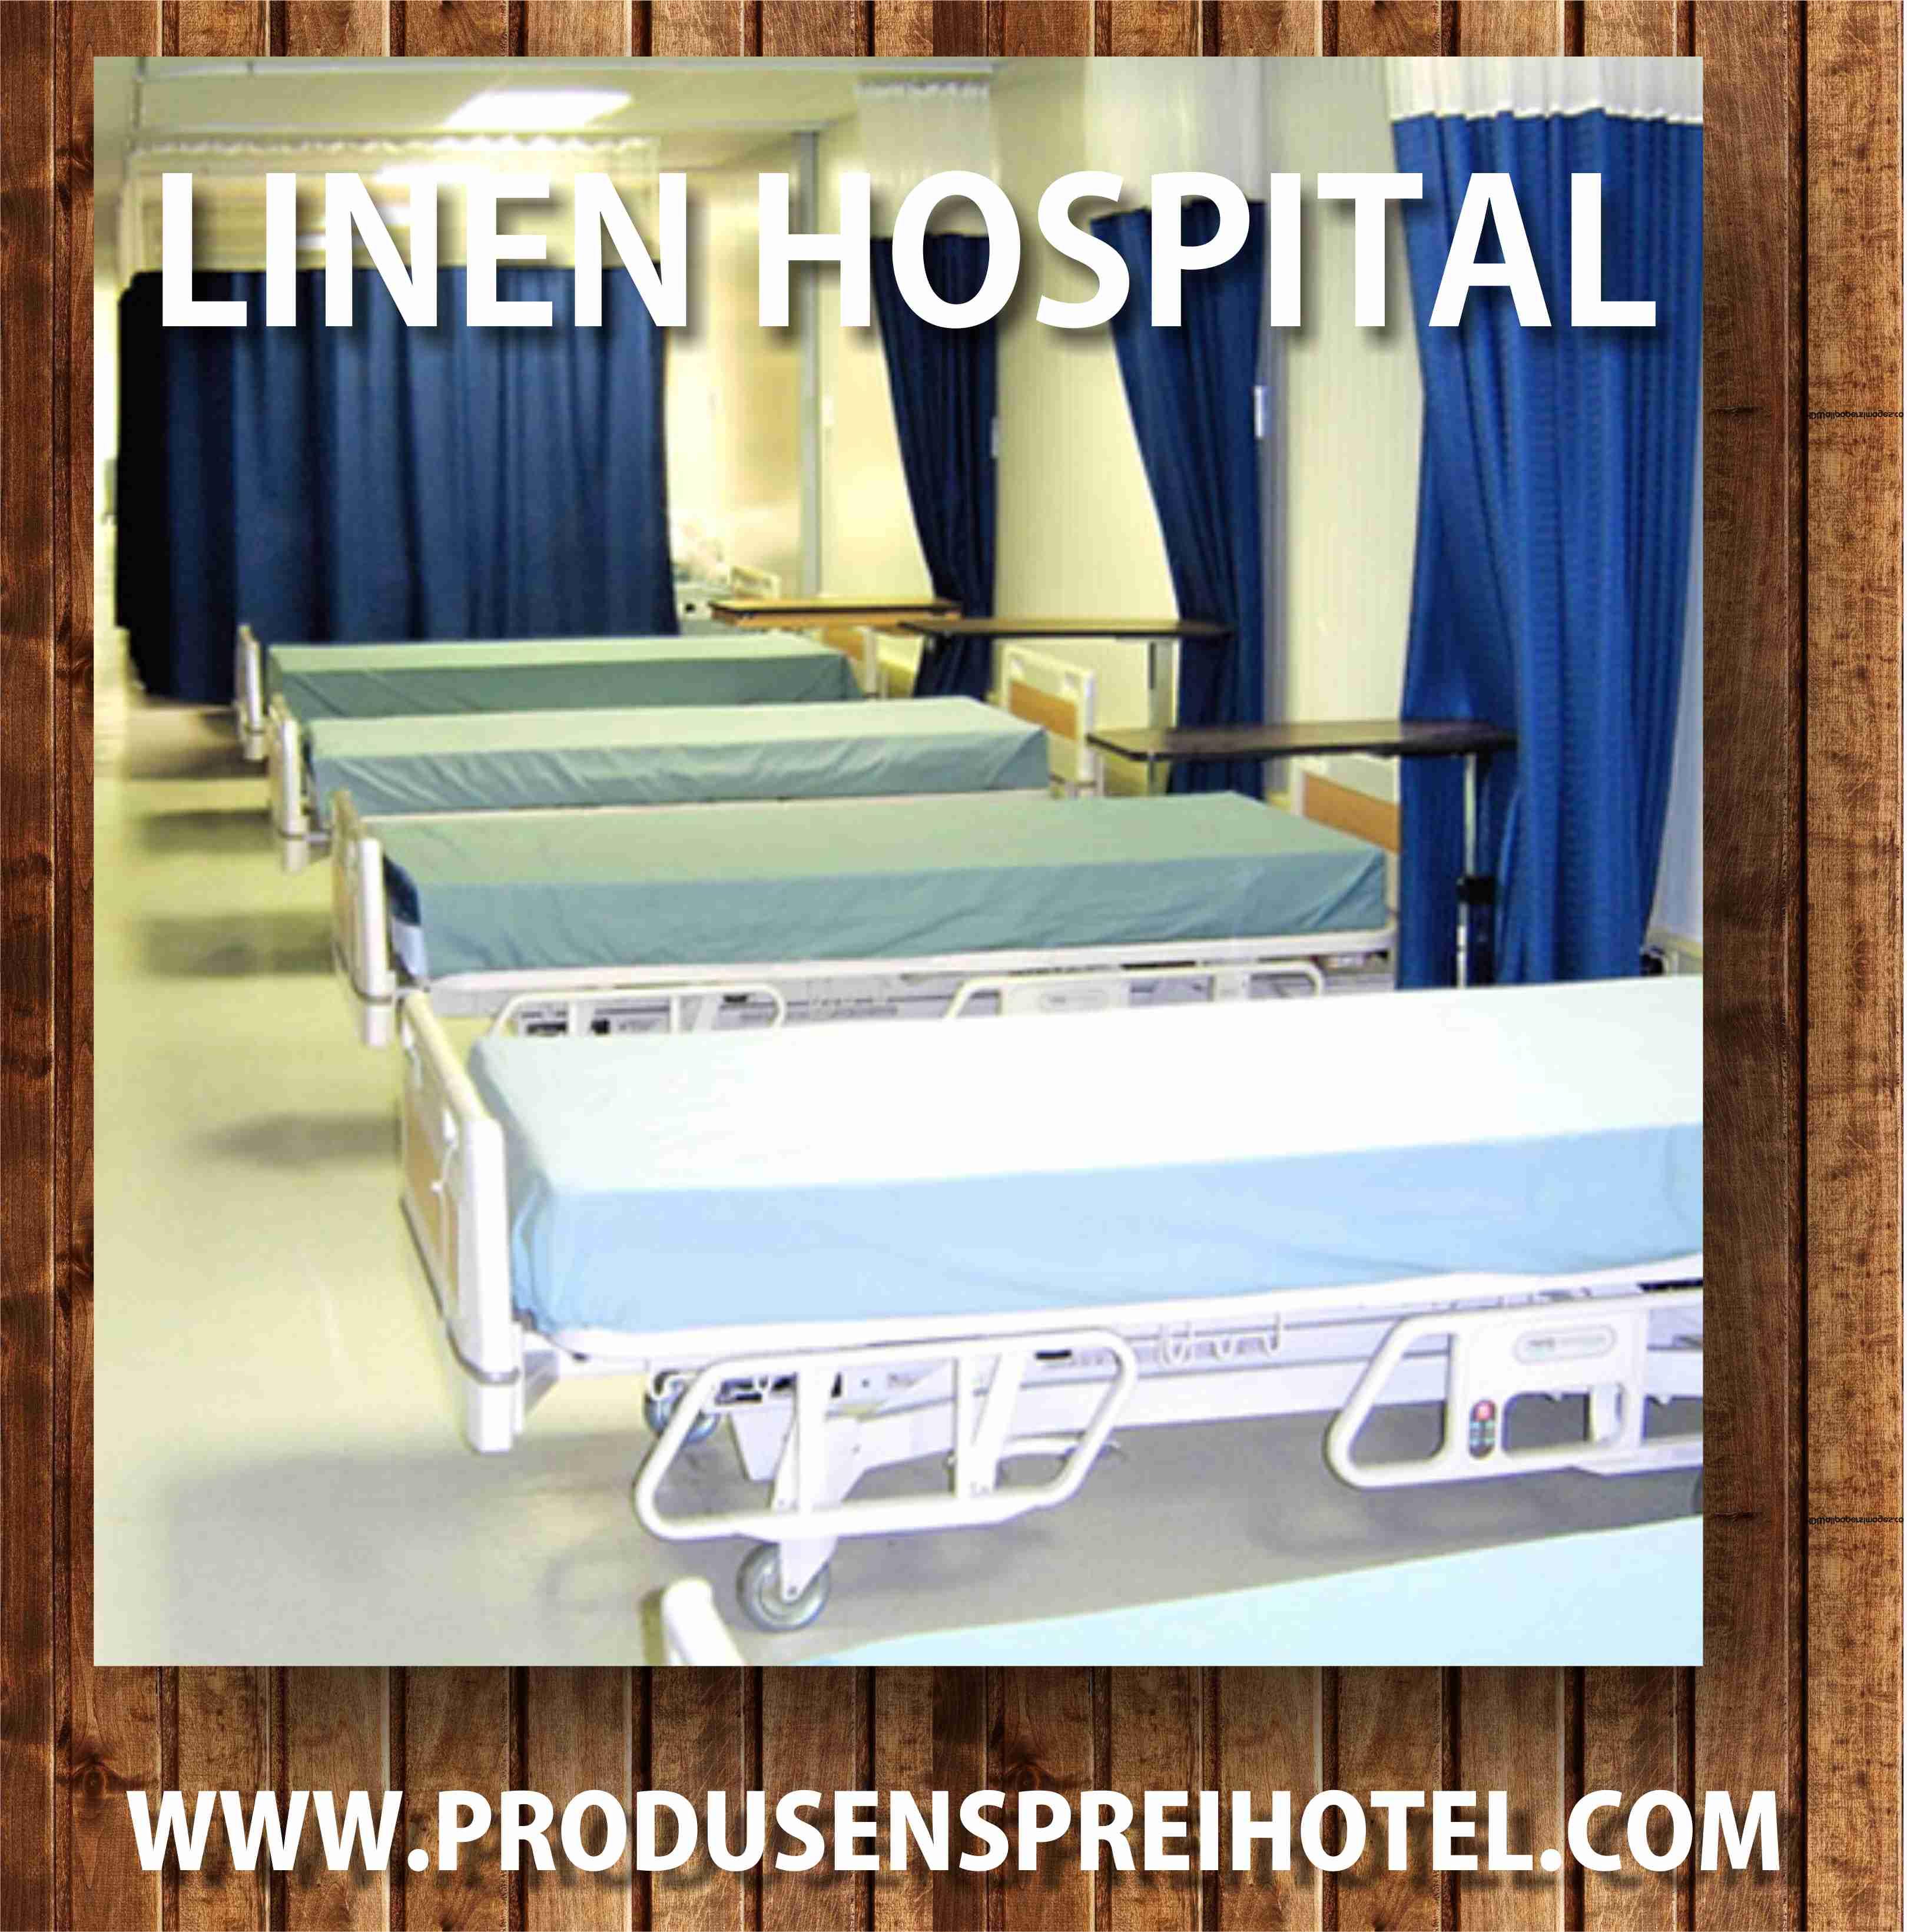 LINEN hospital